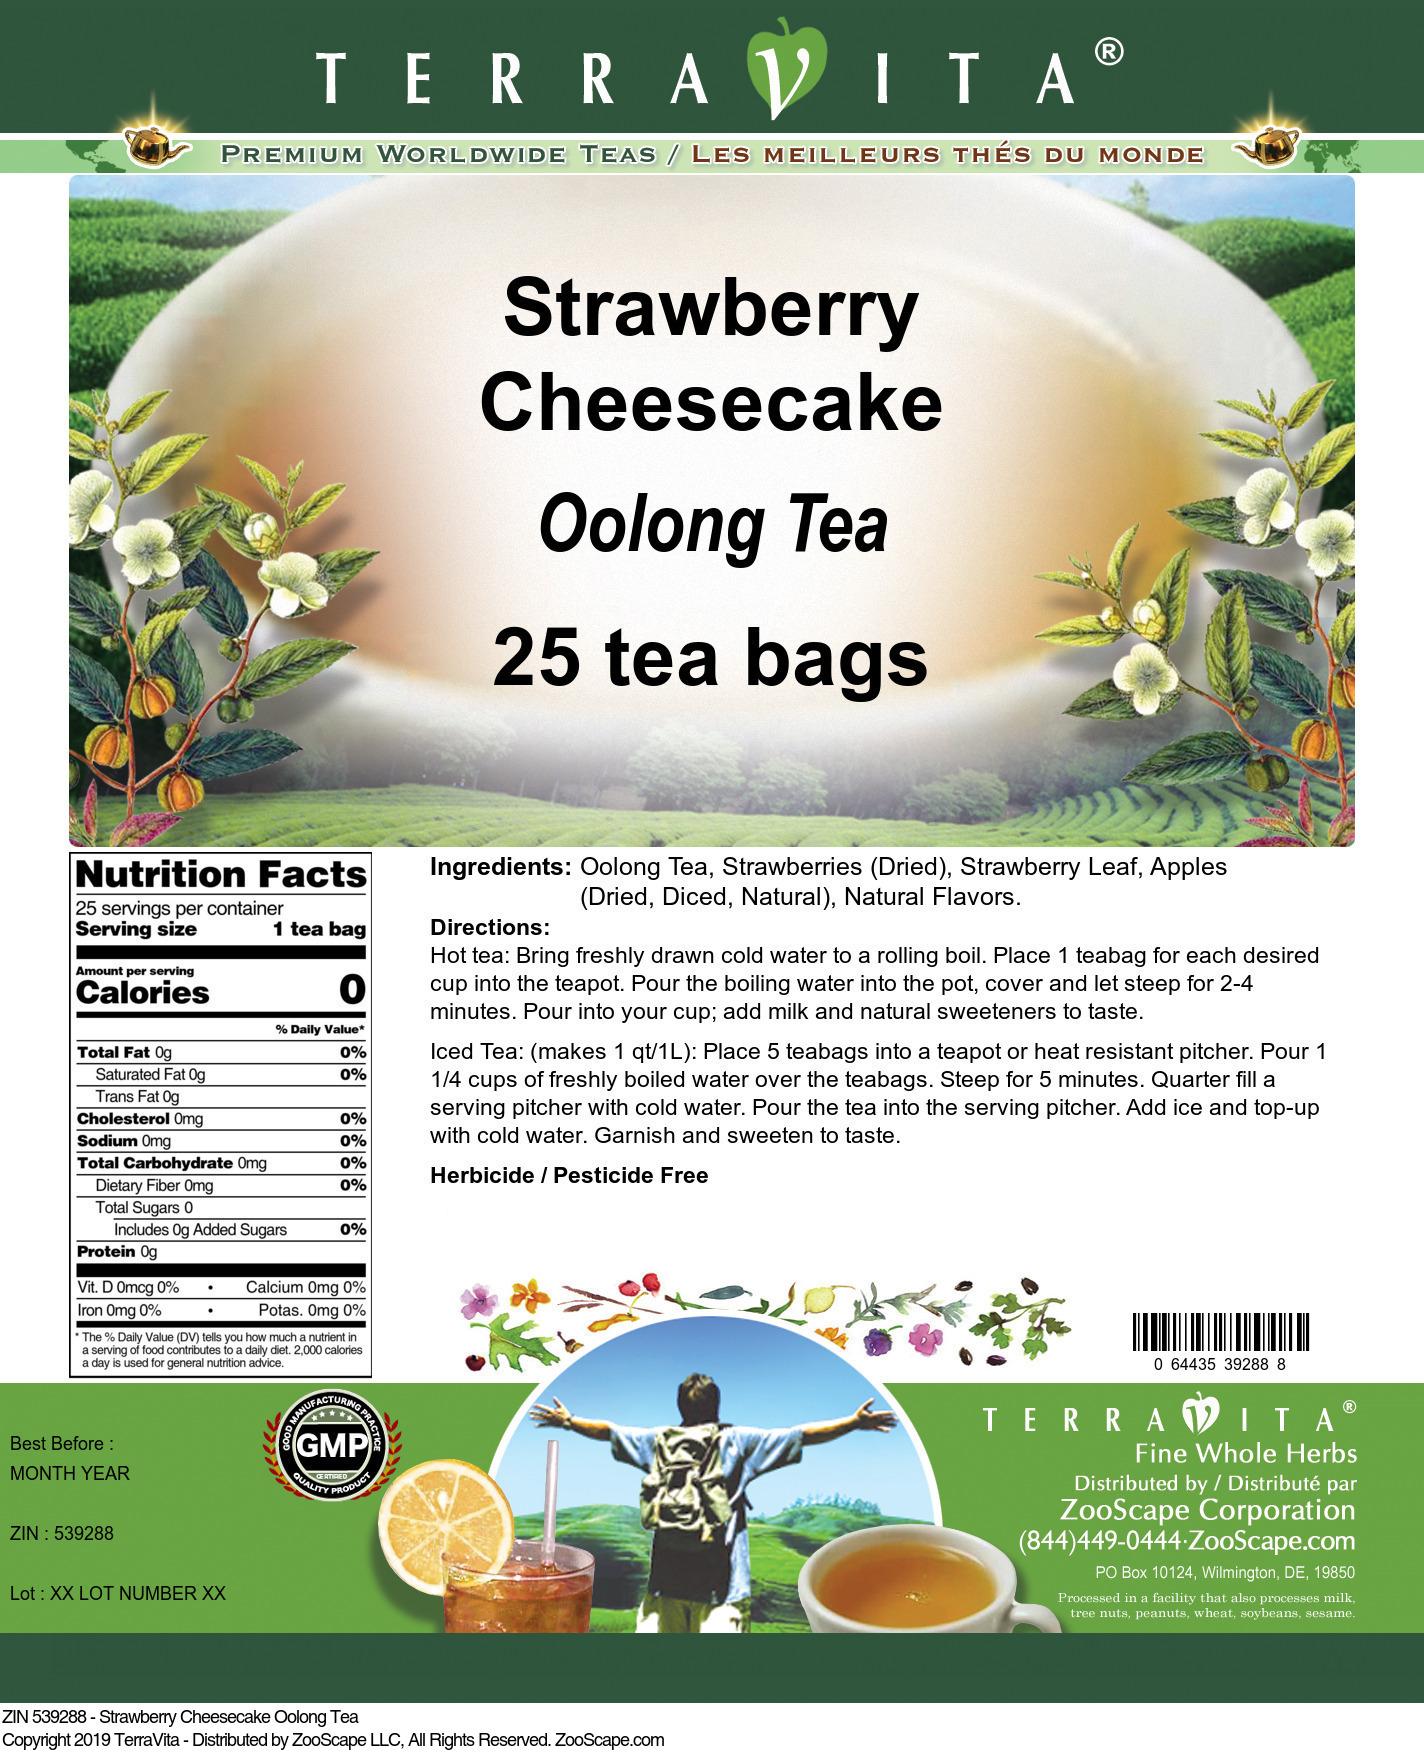 Strawberry Cheesecake Oolong Tea